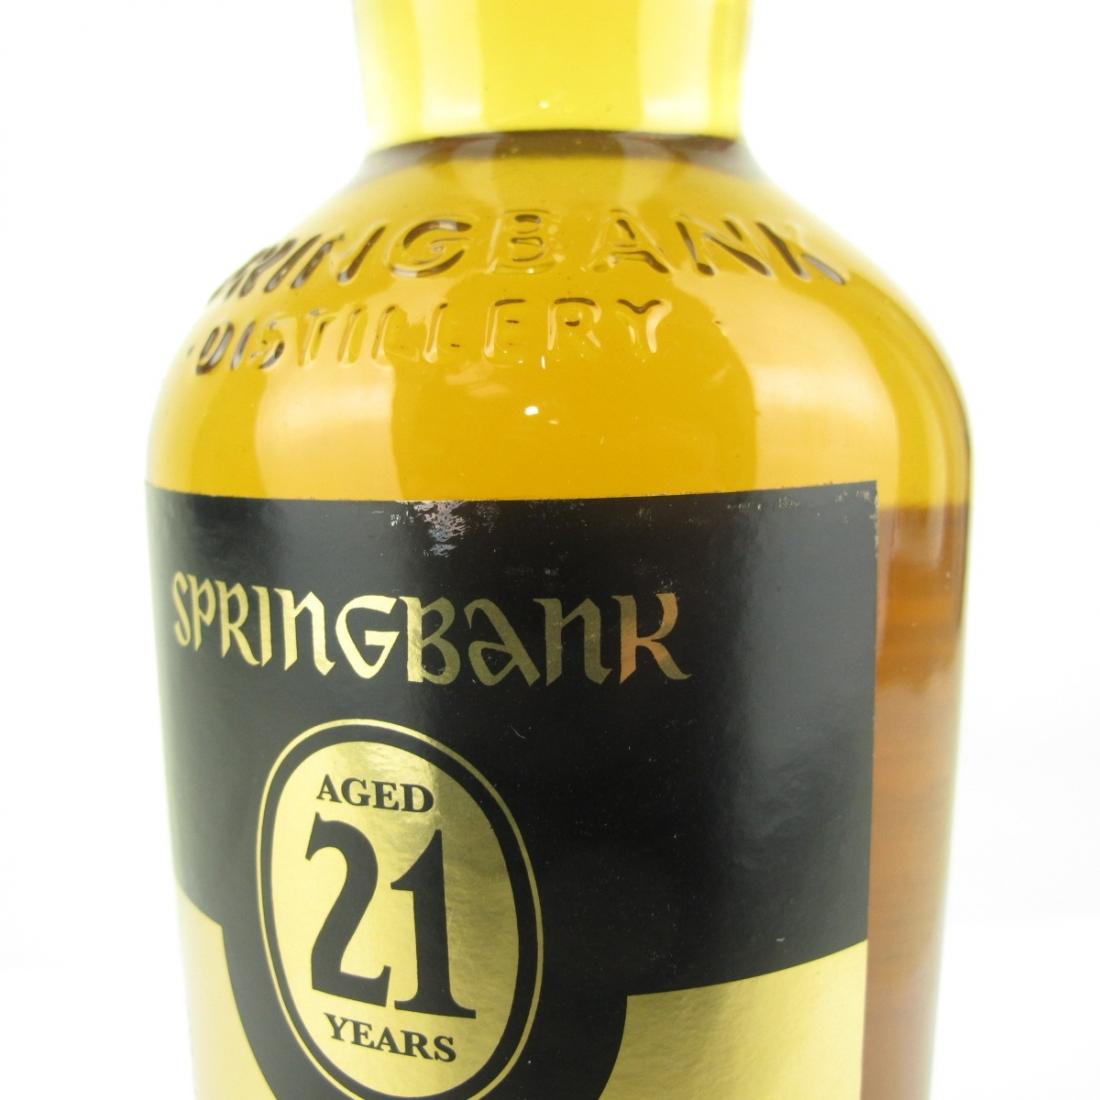 Springbank 21 Year Old Single Cask / Olorosro Sherry